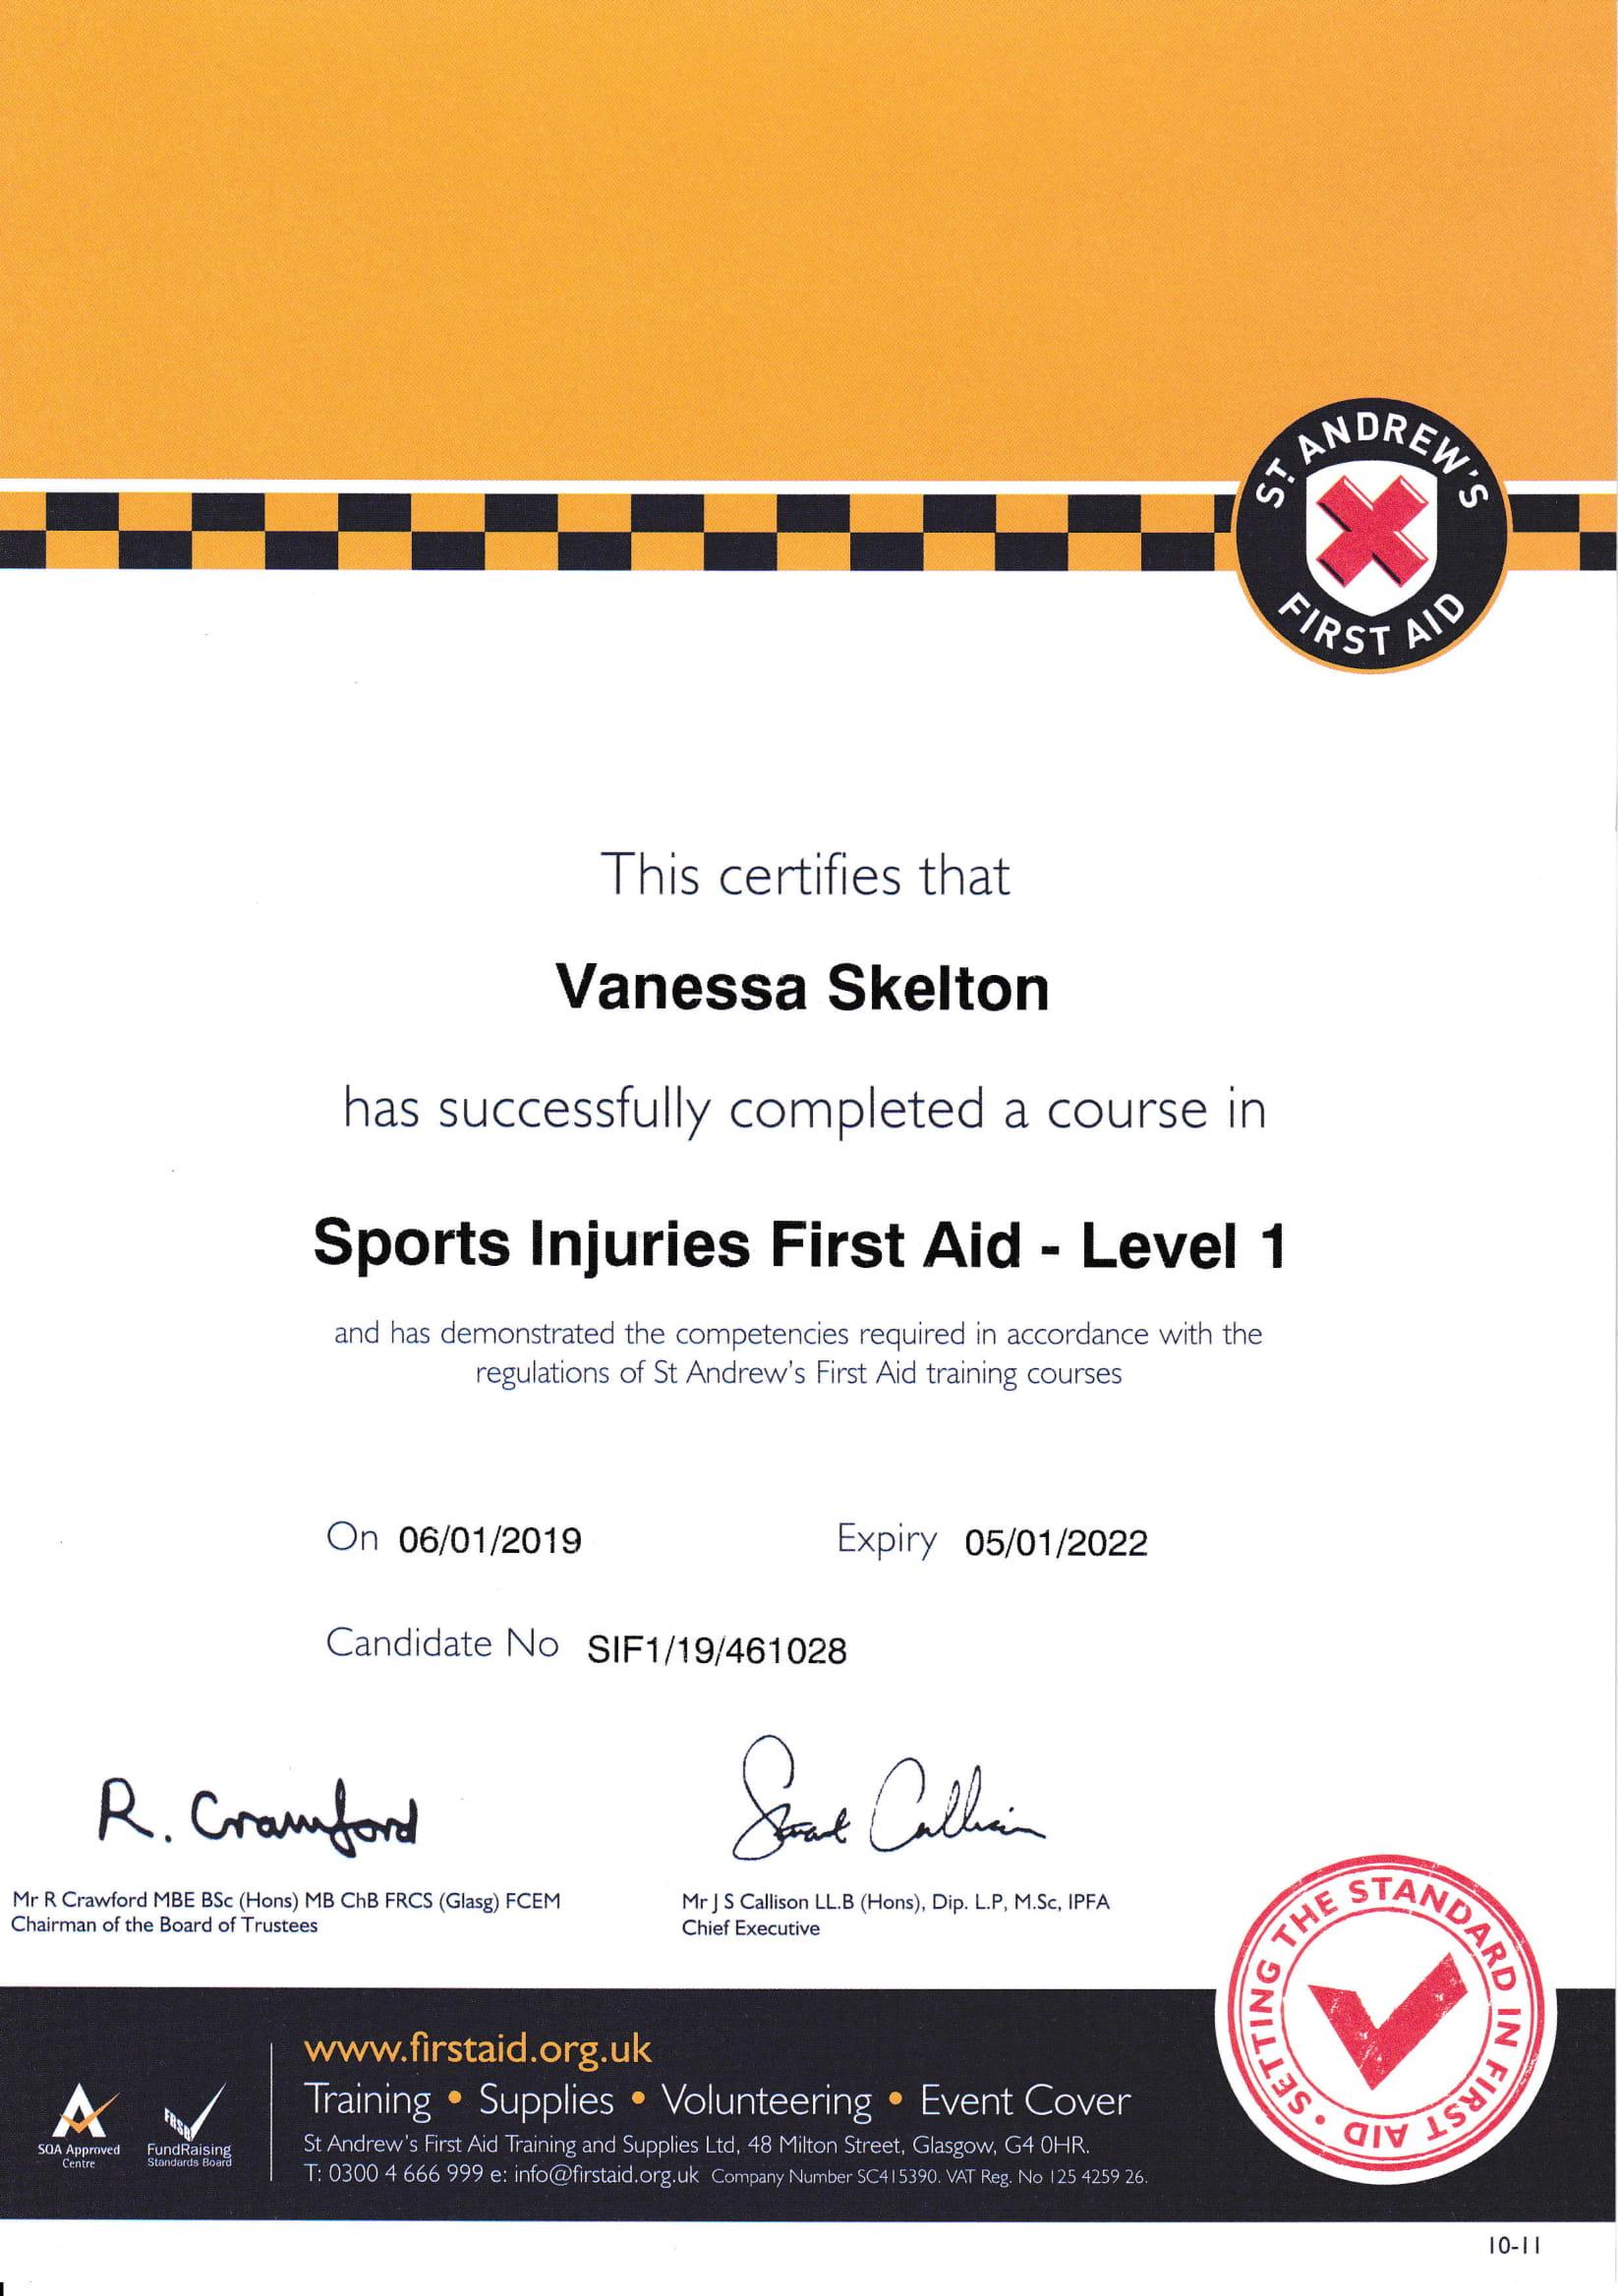 First Aid Certificate 6.1.19-1.jpg